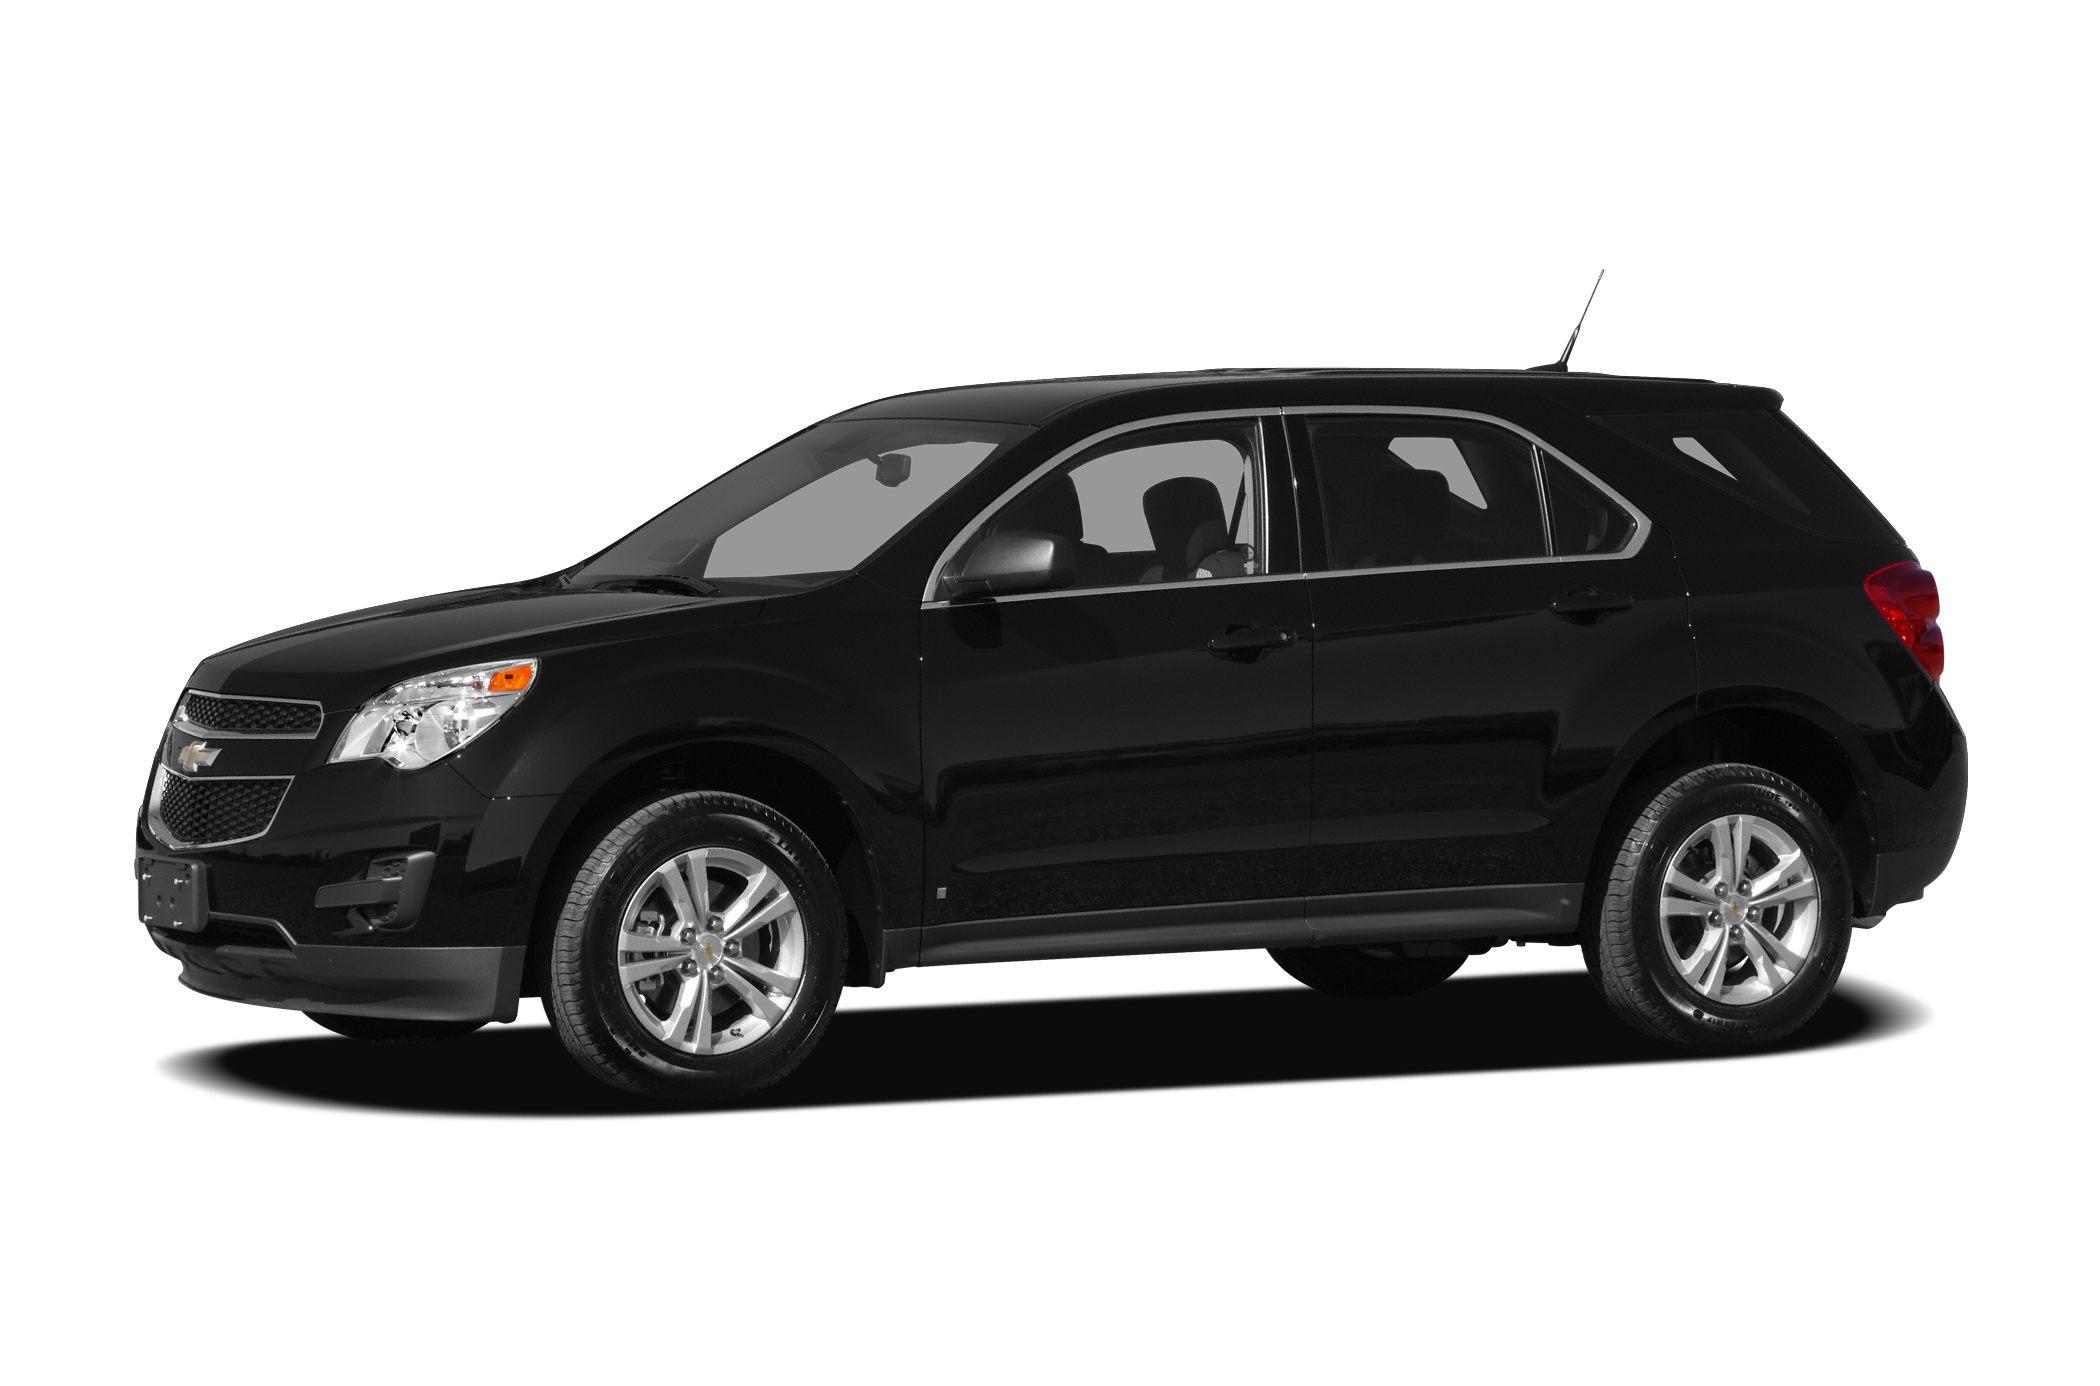 2011 Chevrolet Equinox LTZ Miles 45224Color Maroon Stock 16676 VIN 2CNFLGEC1B6460156